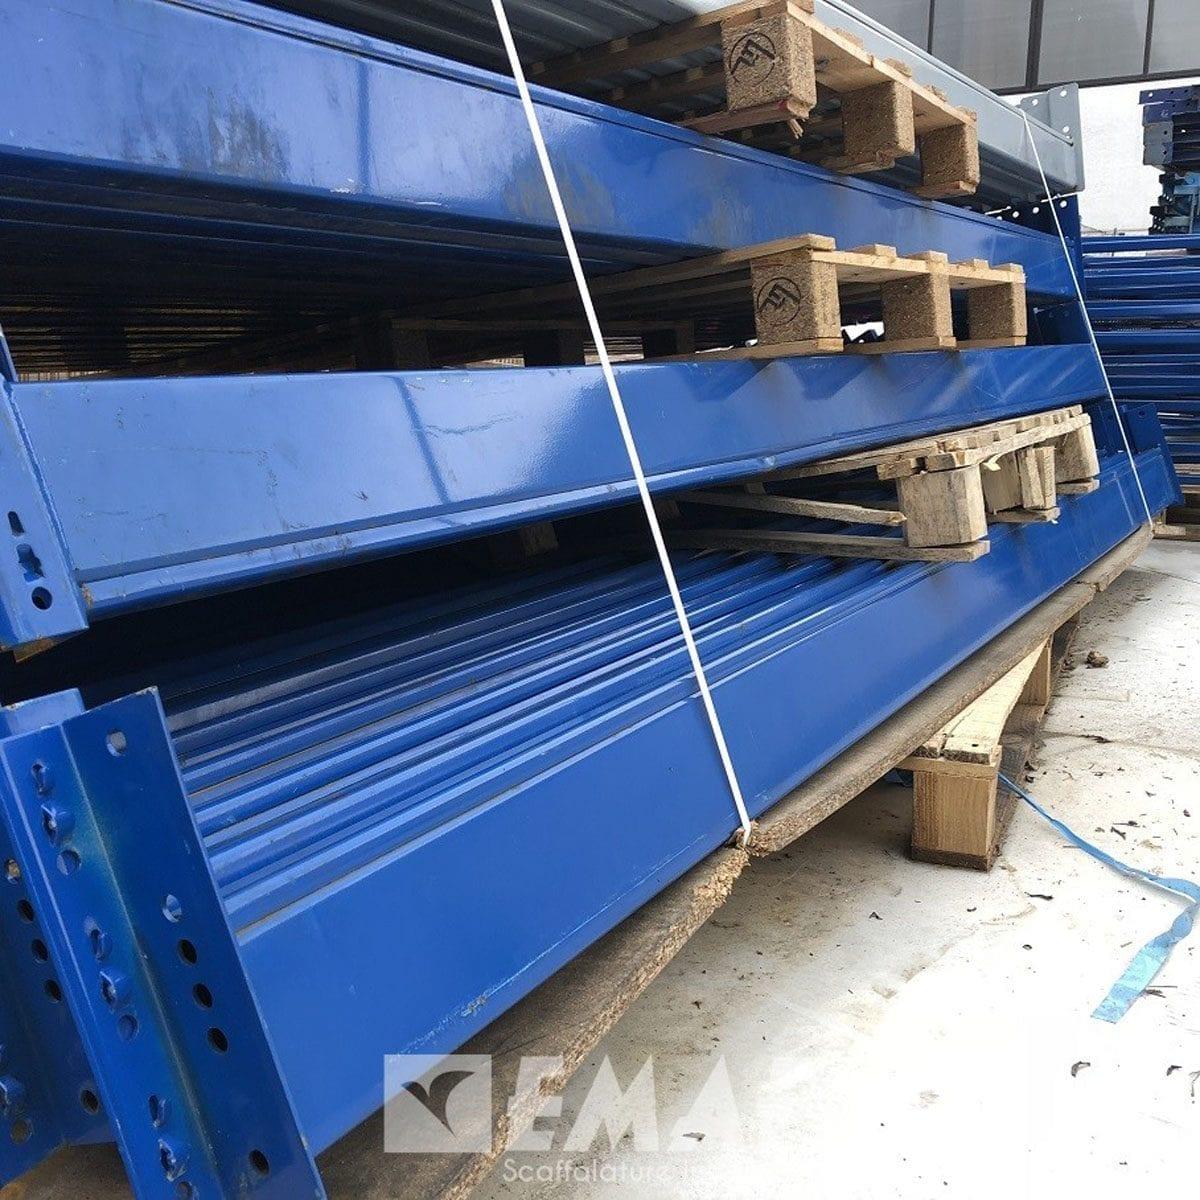 Scaffalature Per Pallets Usate.Portapallet Usato Scaffalatura Industriale Usata Da 90 Bancali Epal